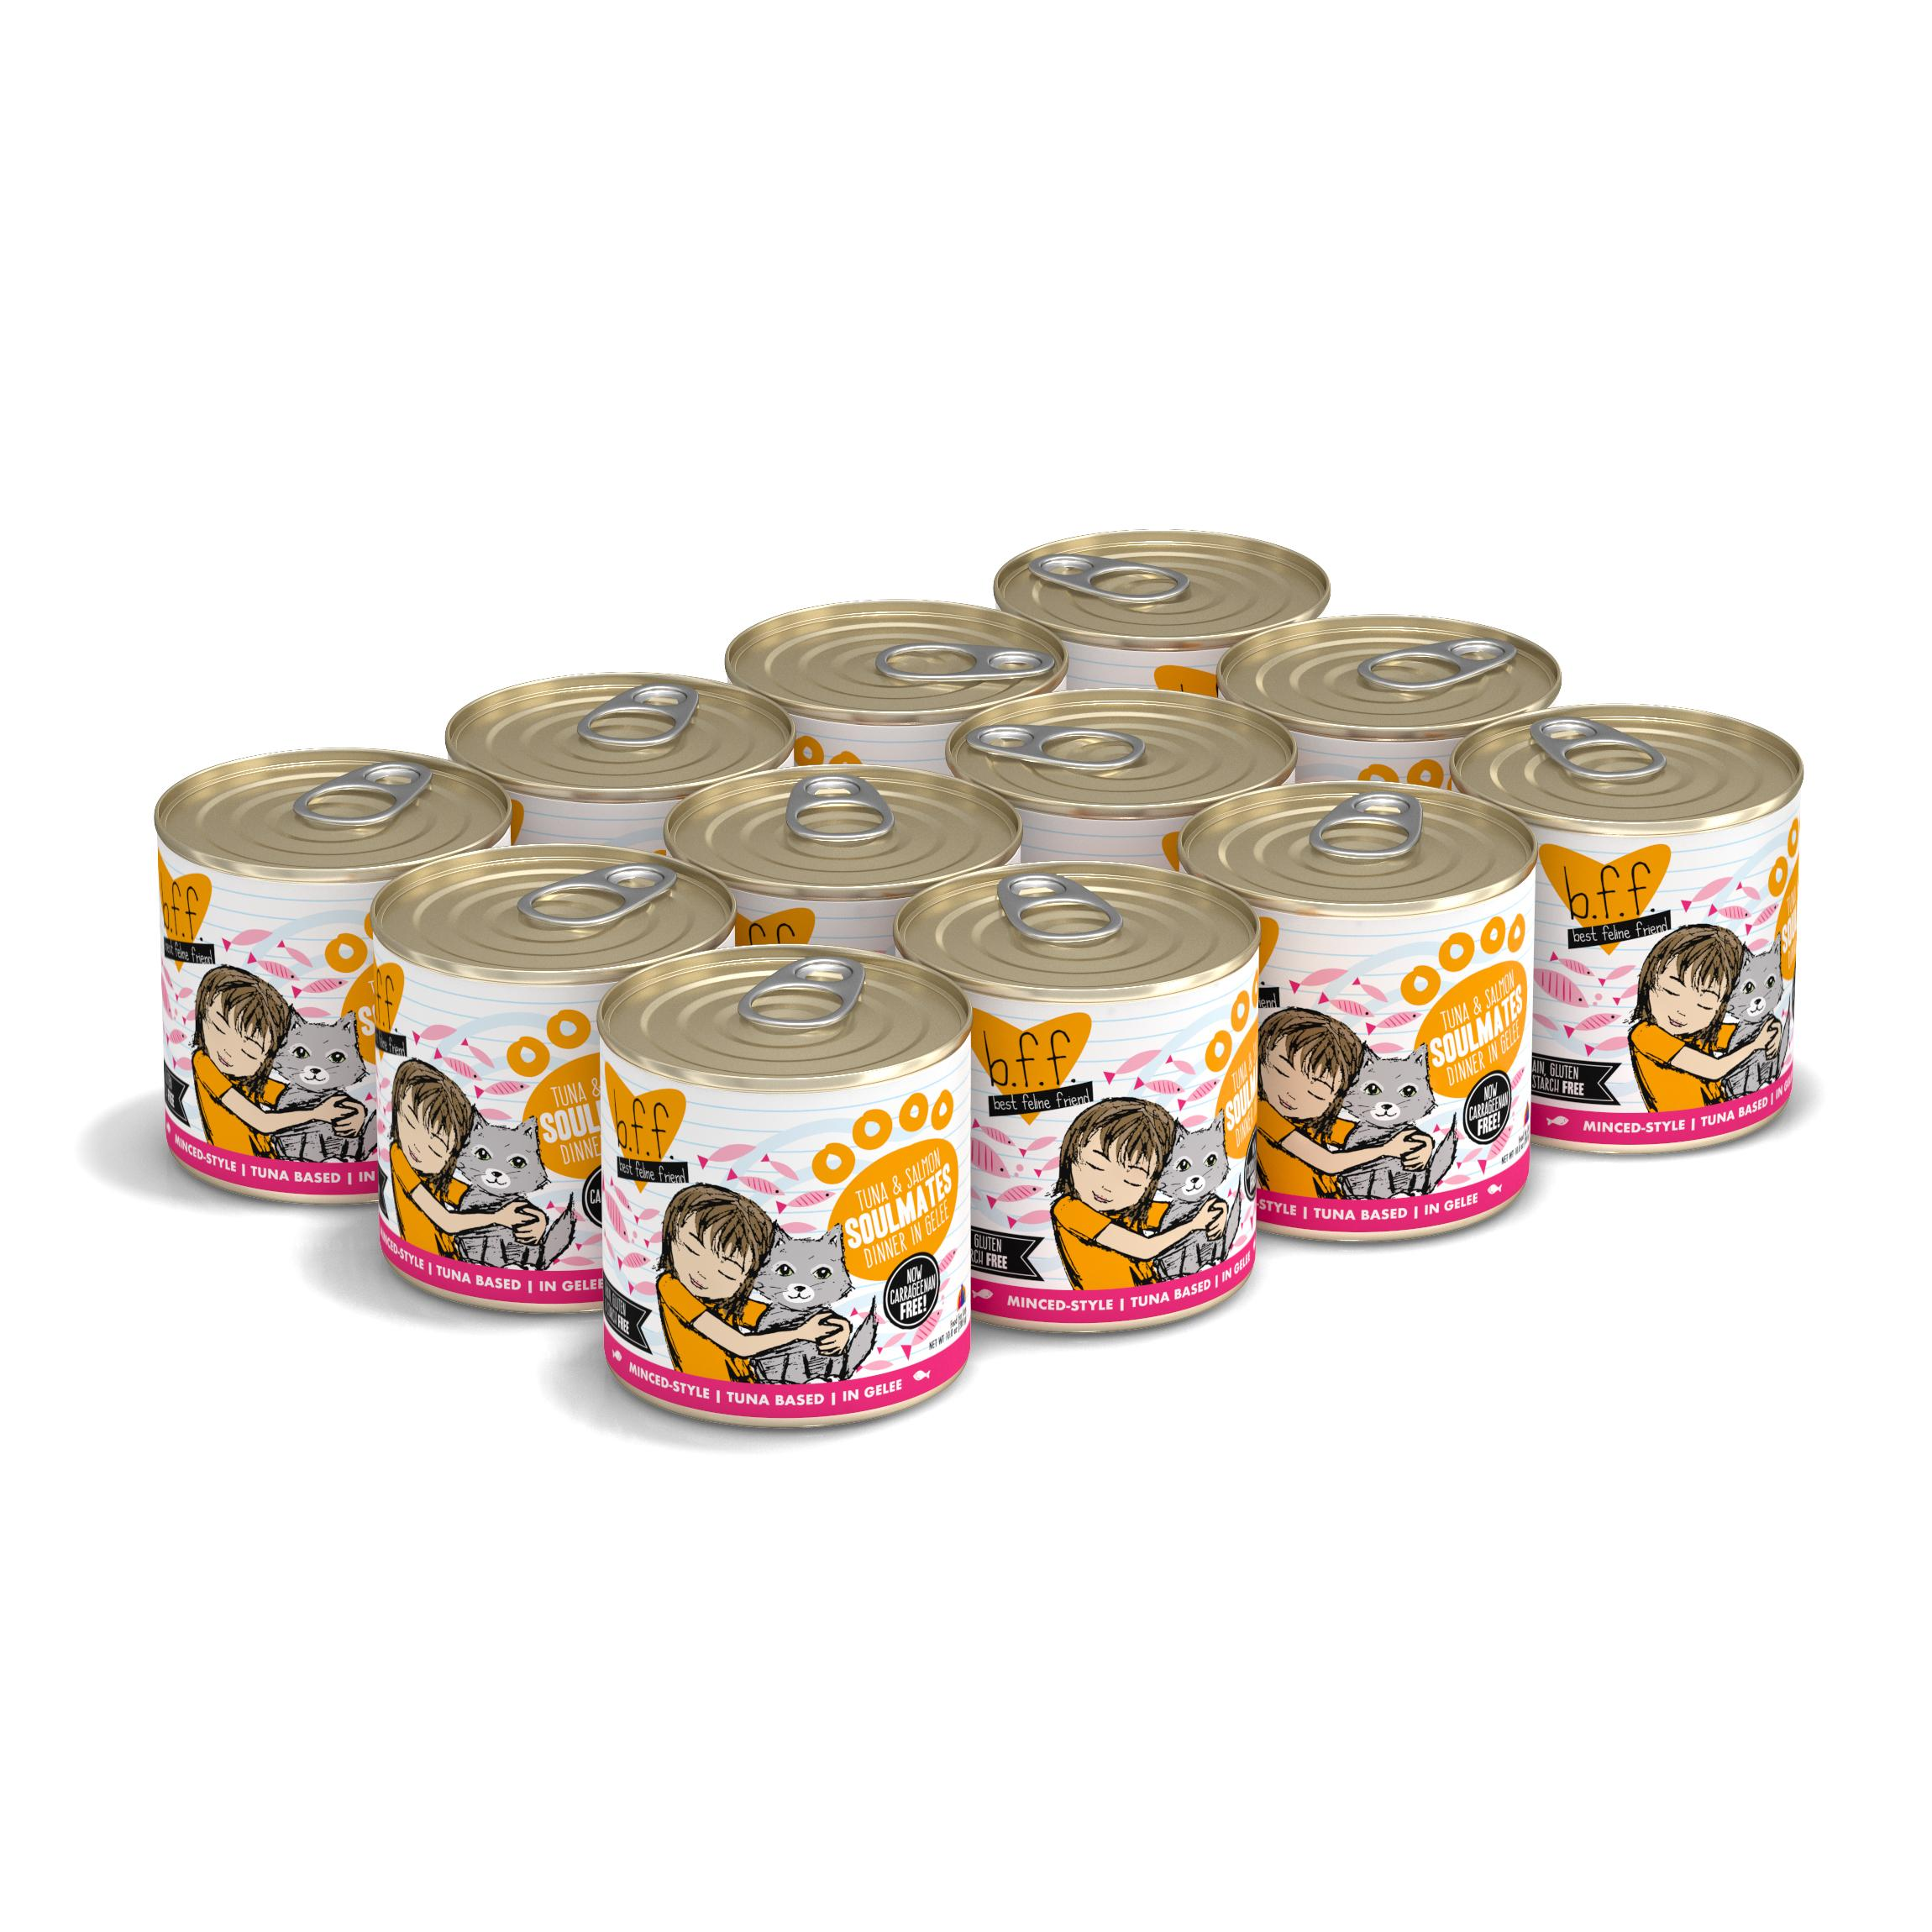 BFF Originals Soulmates Tuna & Salmon Dinner in Gelee Grain-Free Wet Cat Food, 10-oz, tray of 12